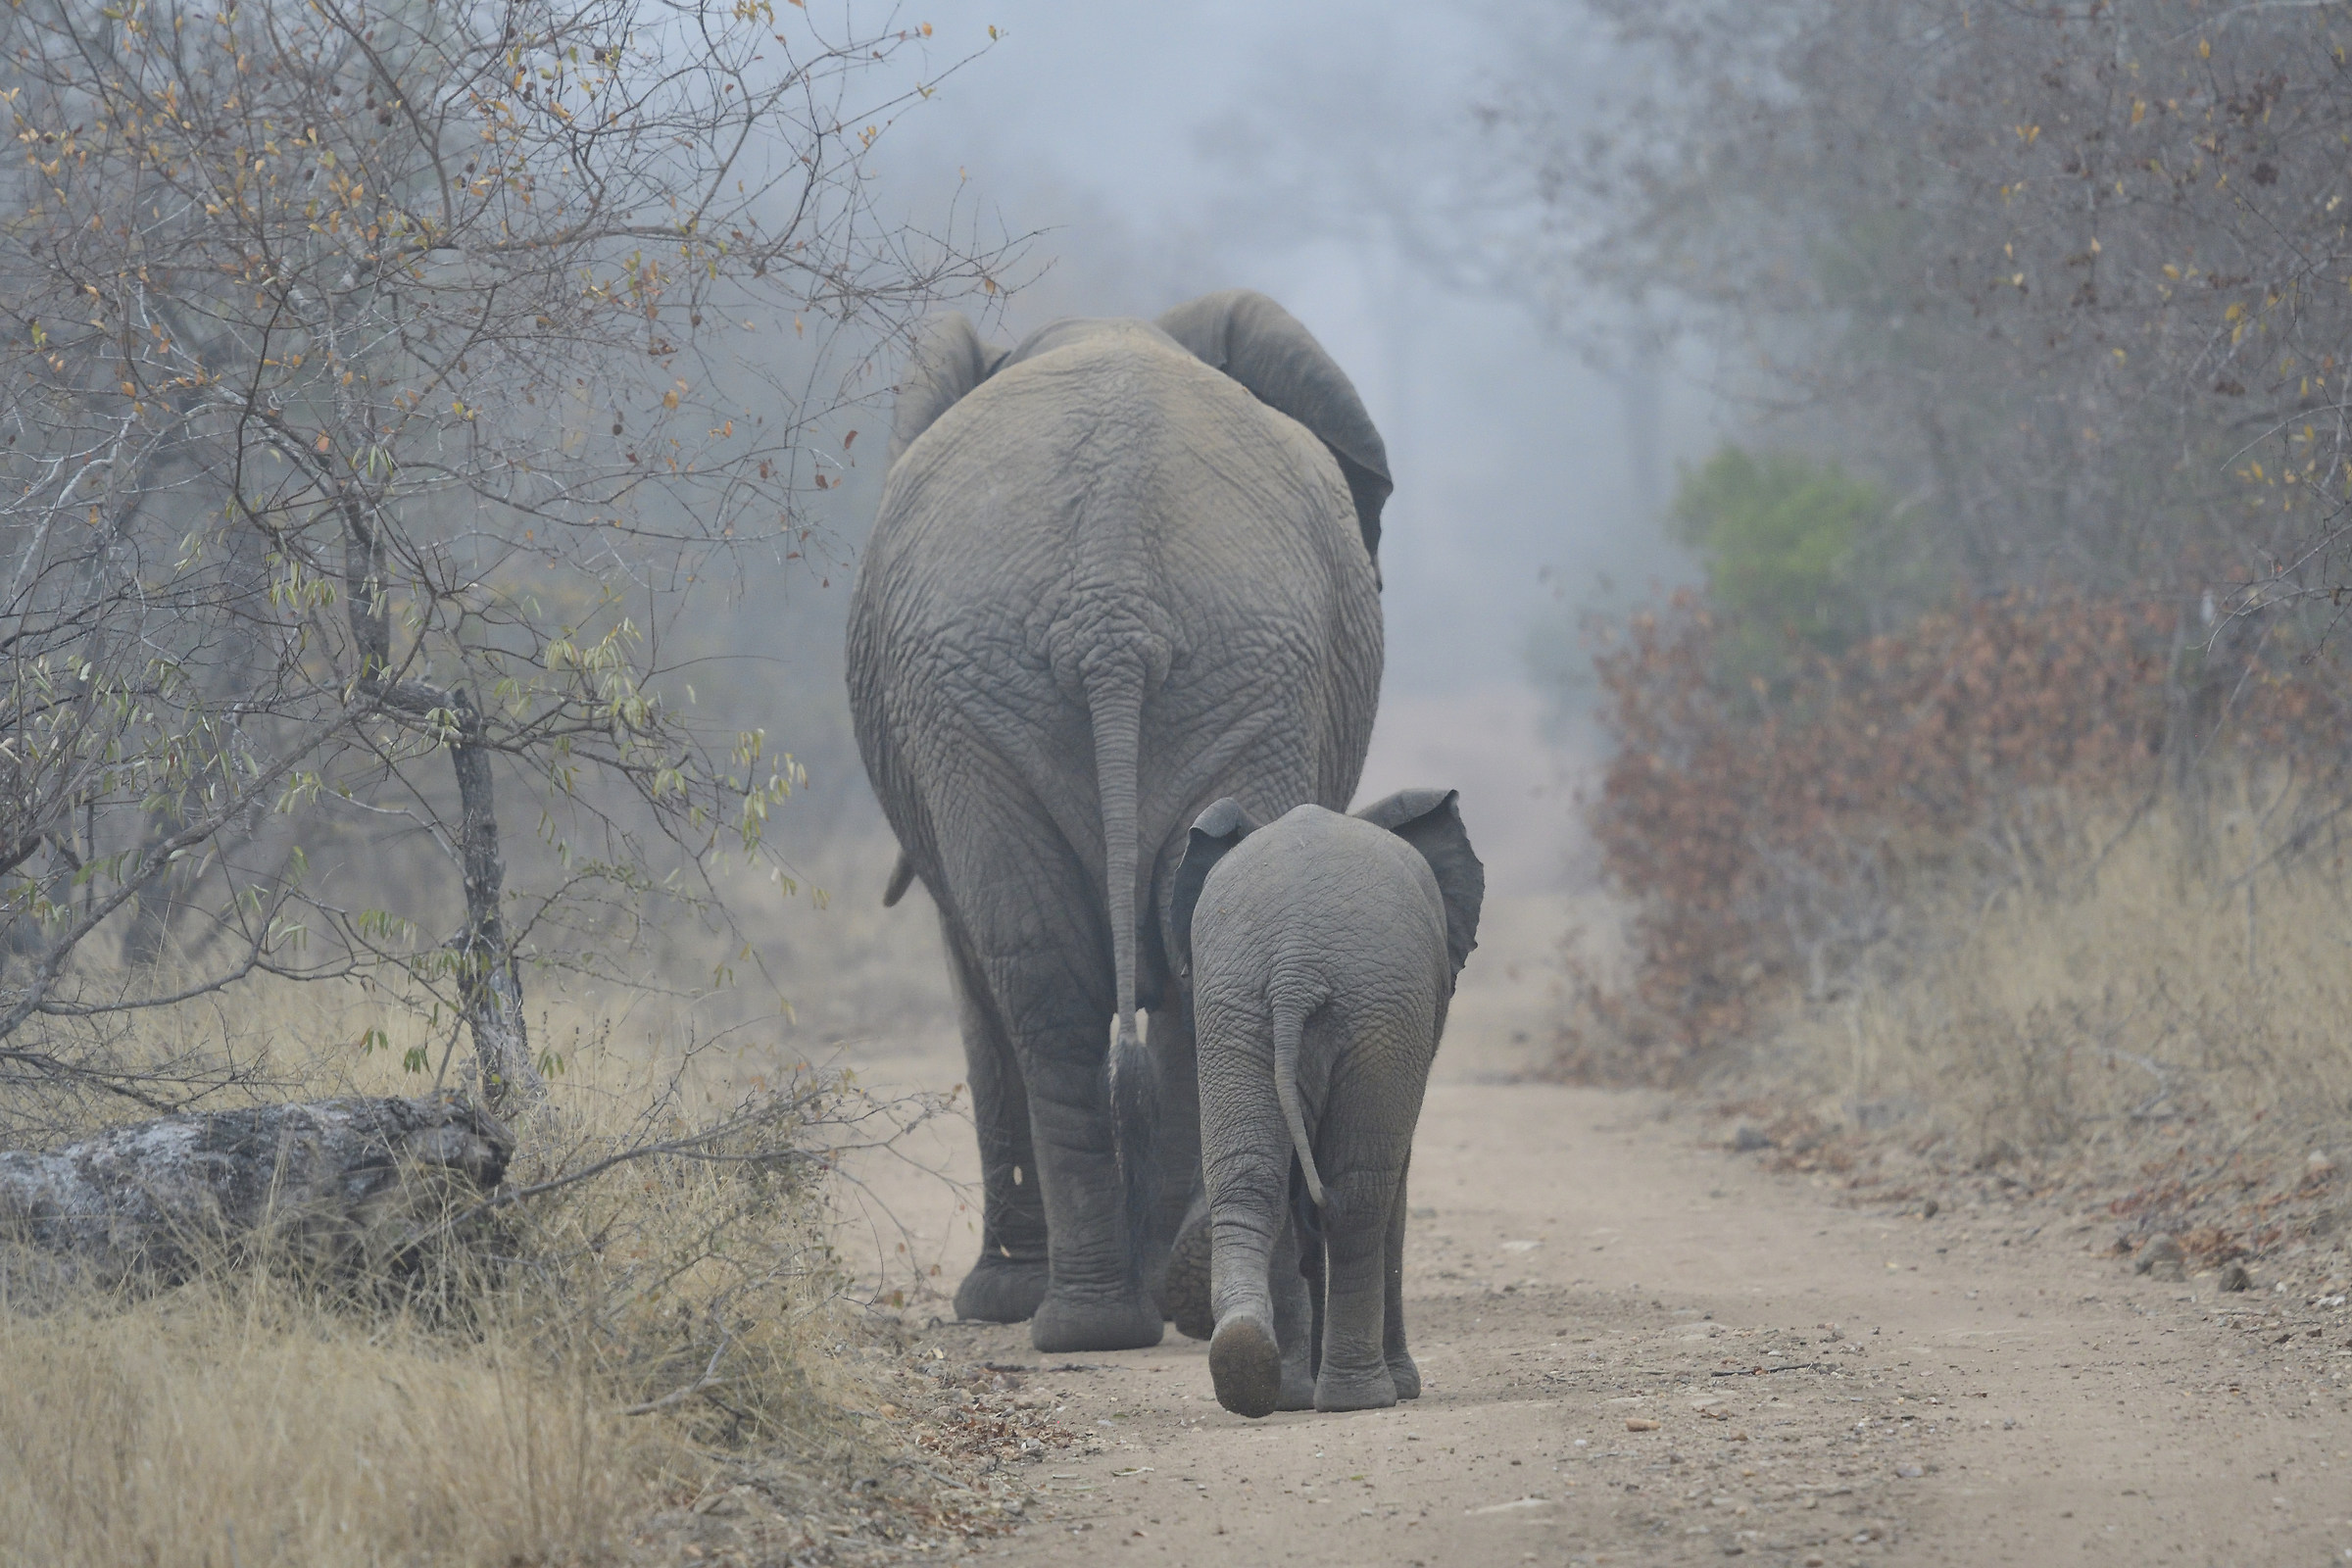 Elephants in South African fog...